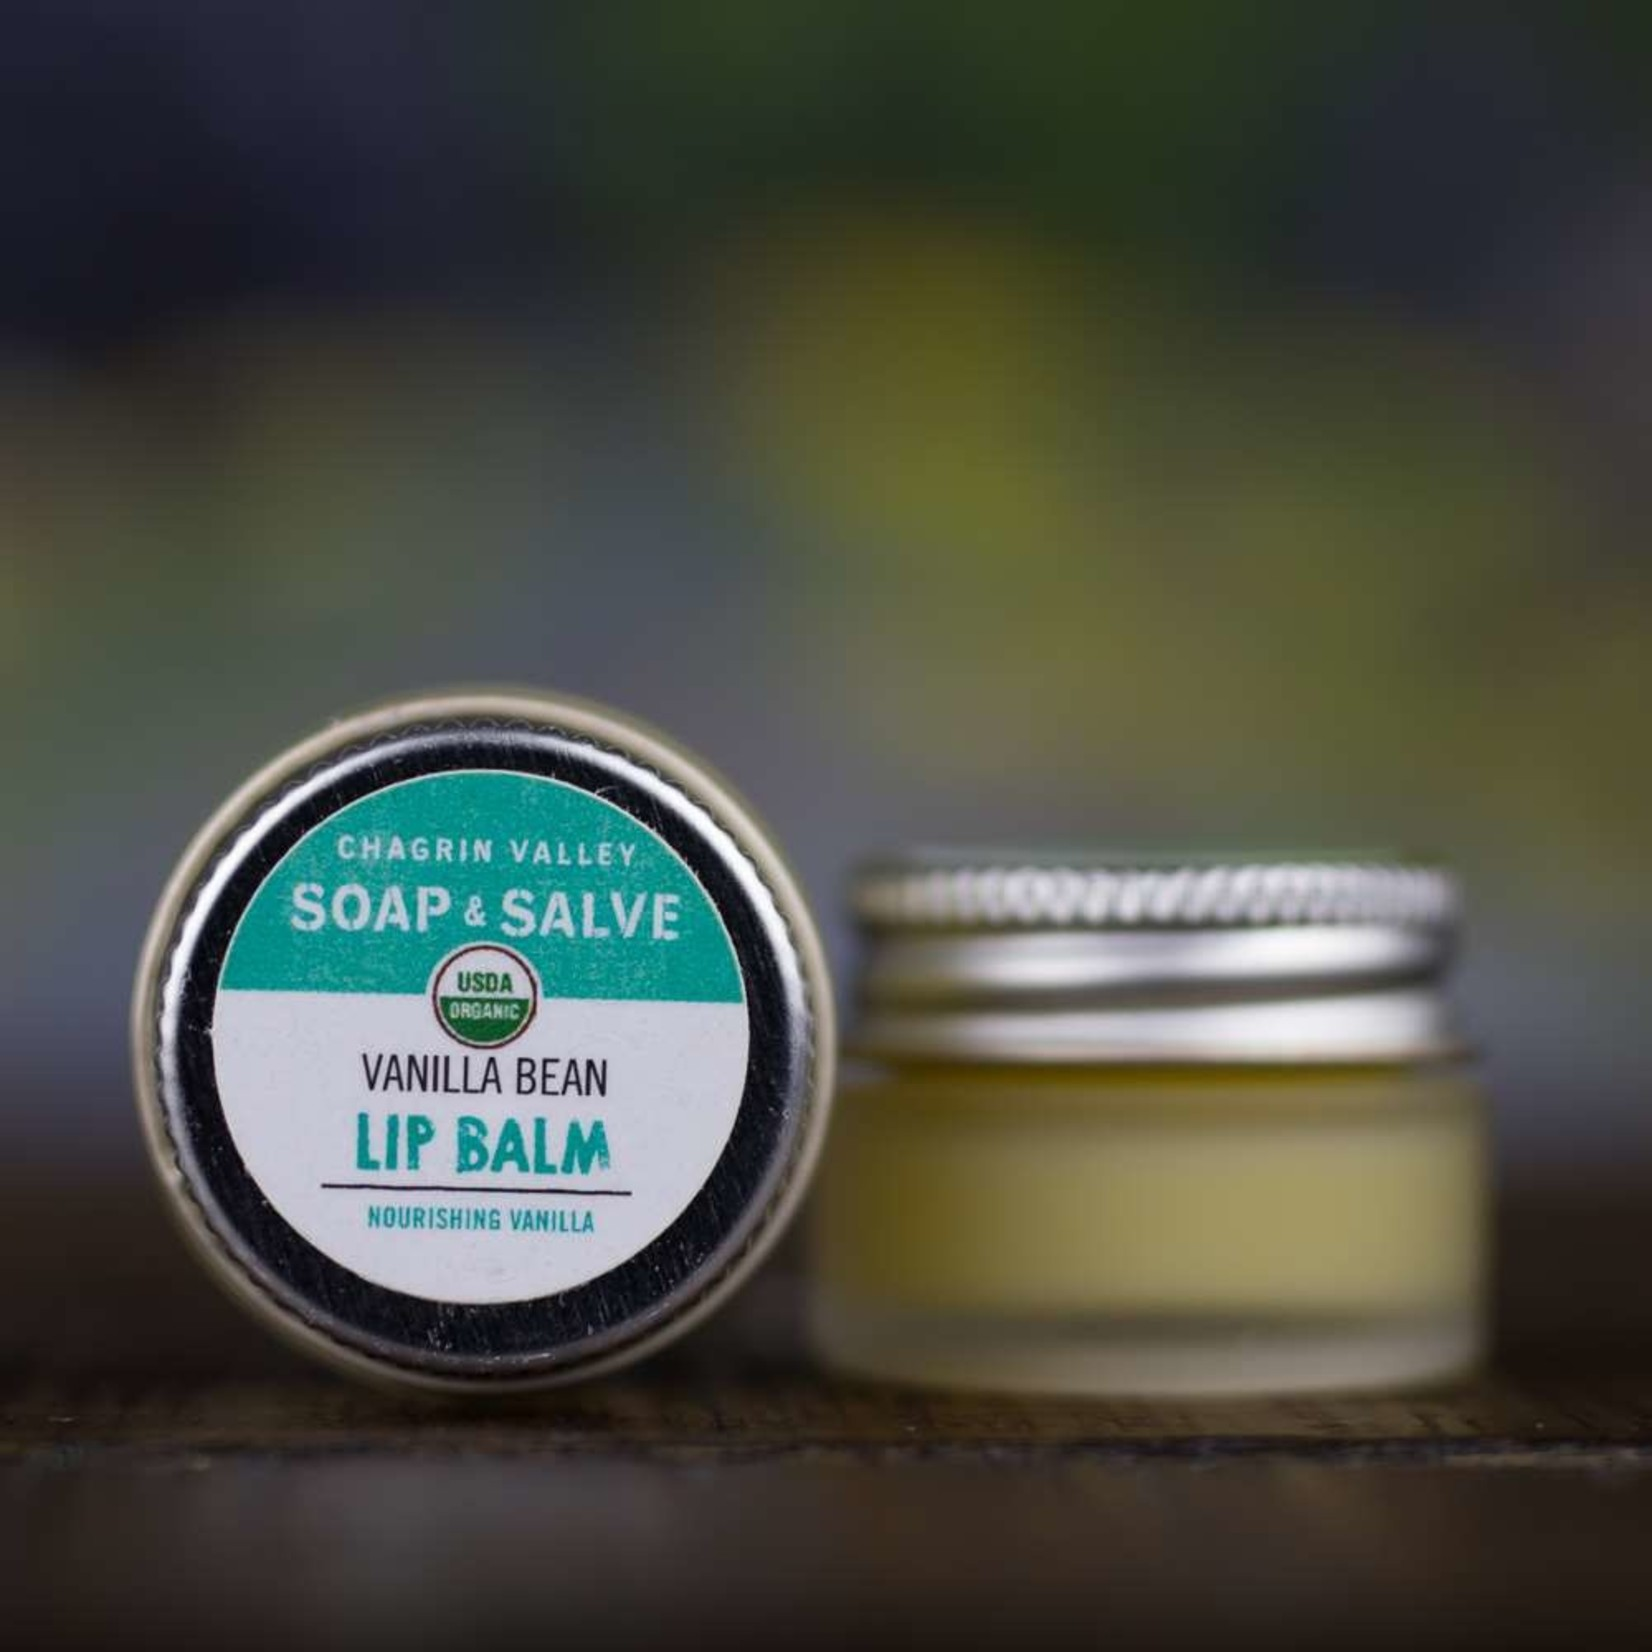 Chagrin Valley Soap and Salve Vanilla Bean Lip Balm .25oz Jar